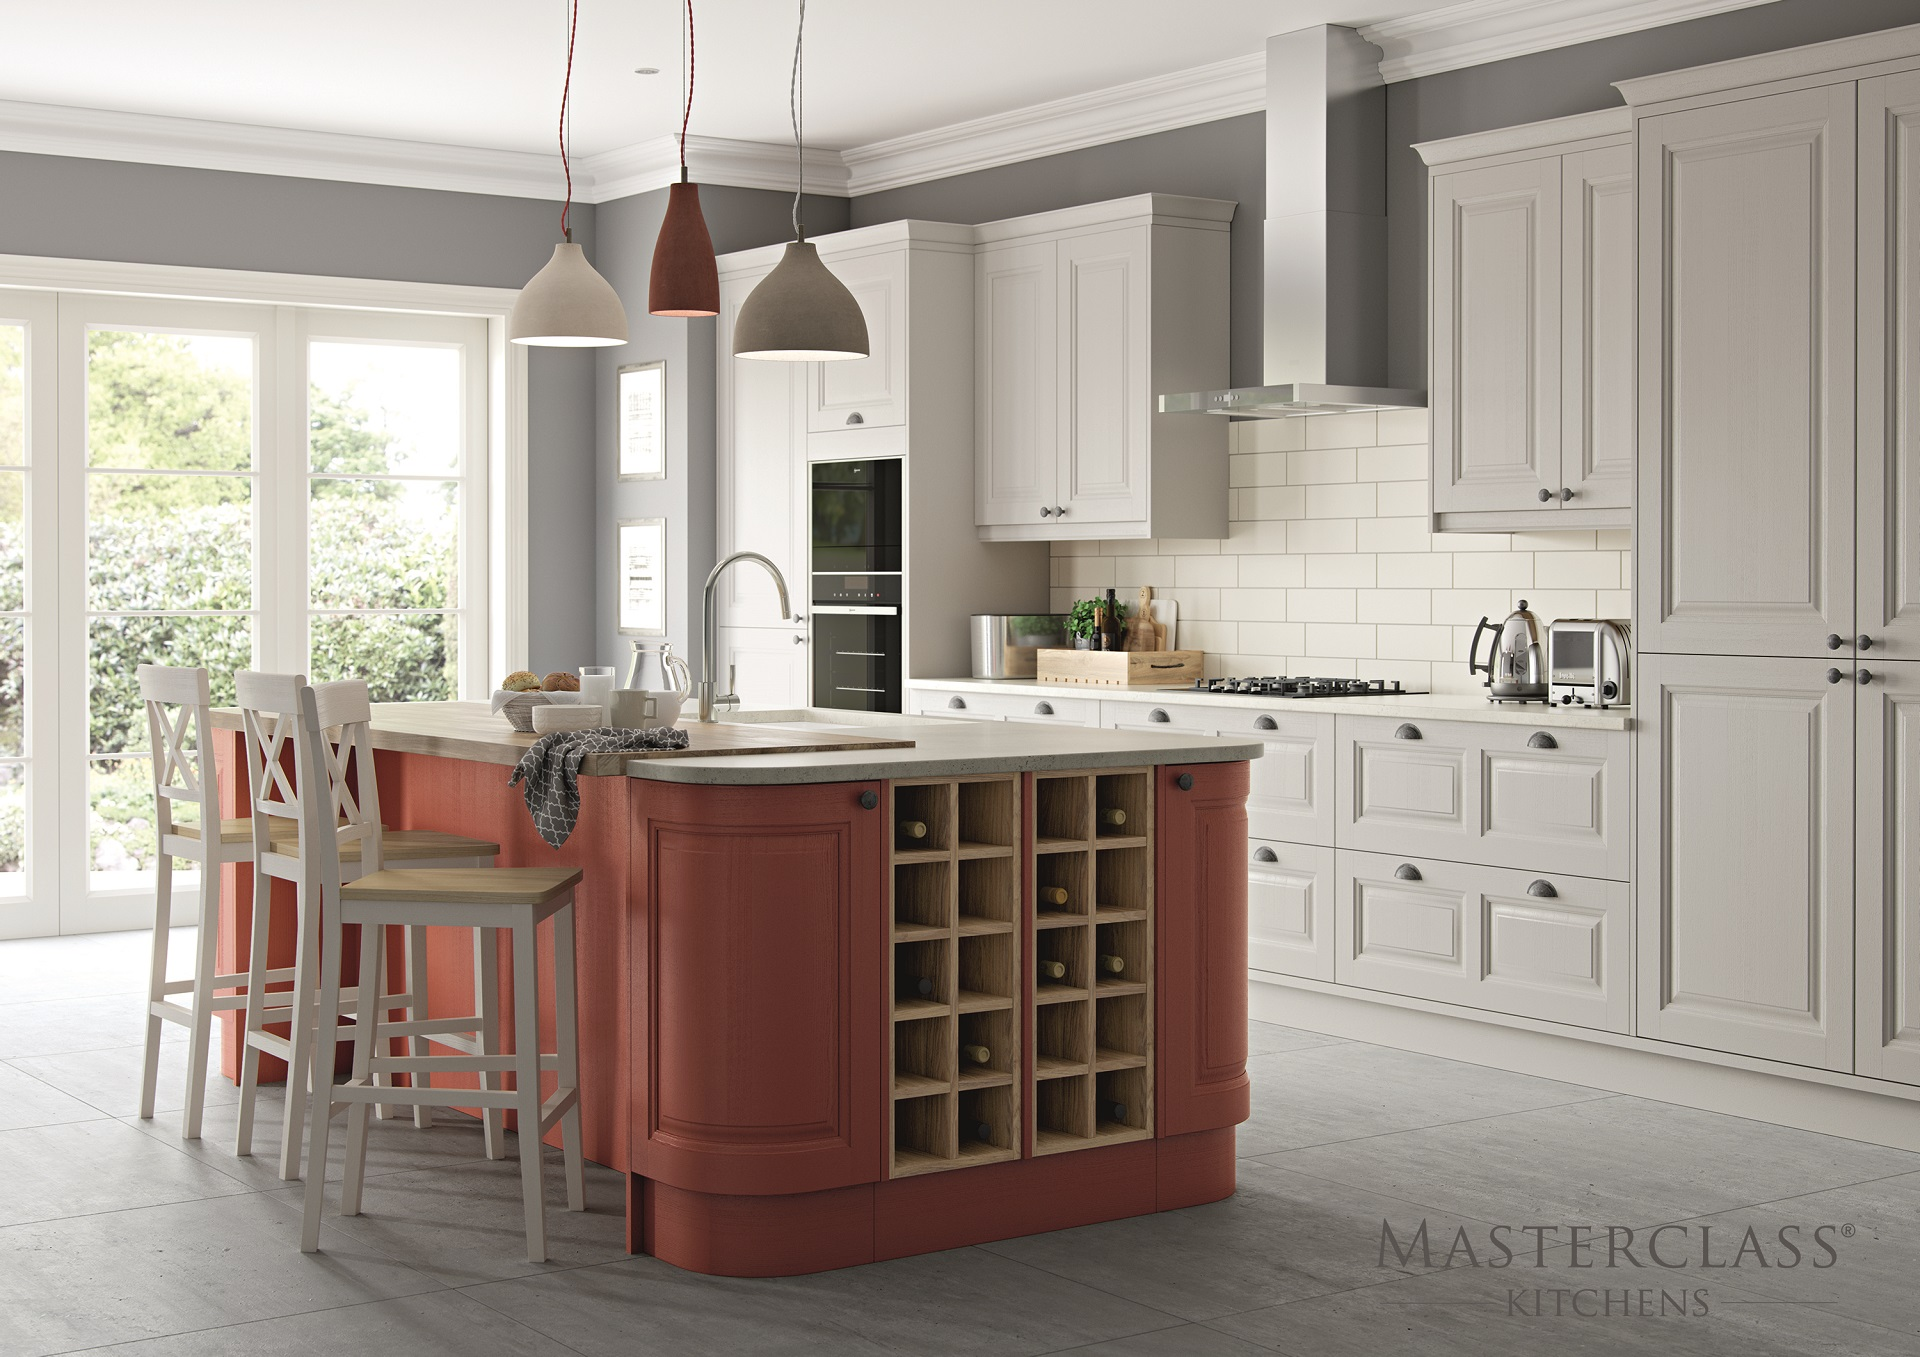 CARNEGIE_MAIN_SCOTS_GREY_TERRACOTTA_SUNSET luxury classic kitchen design